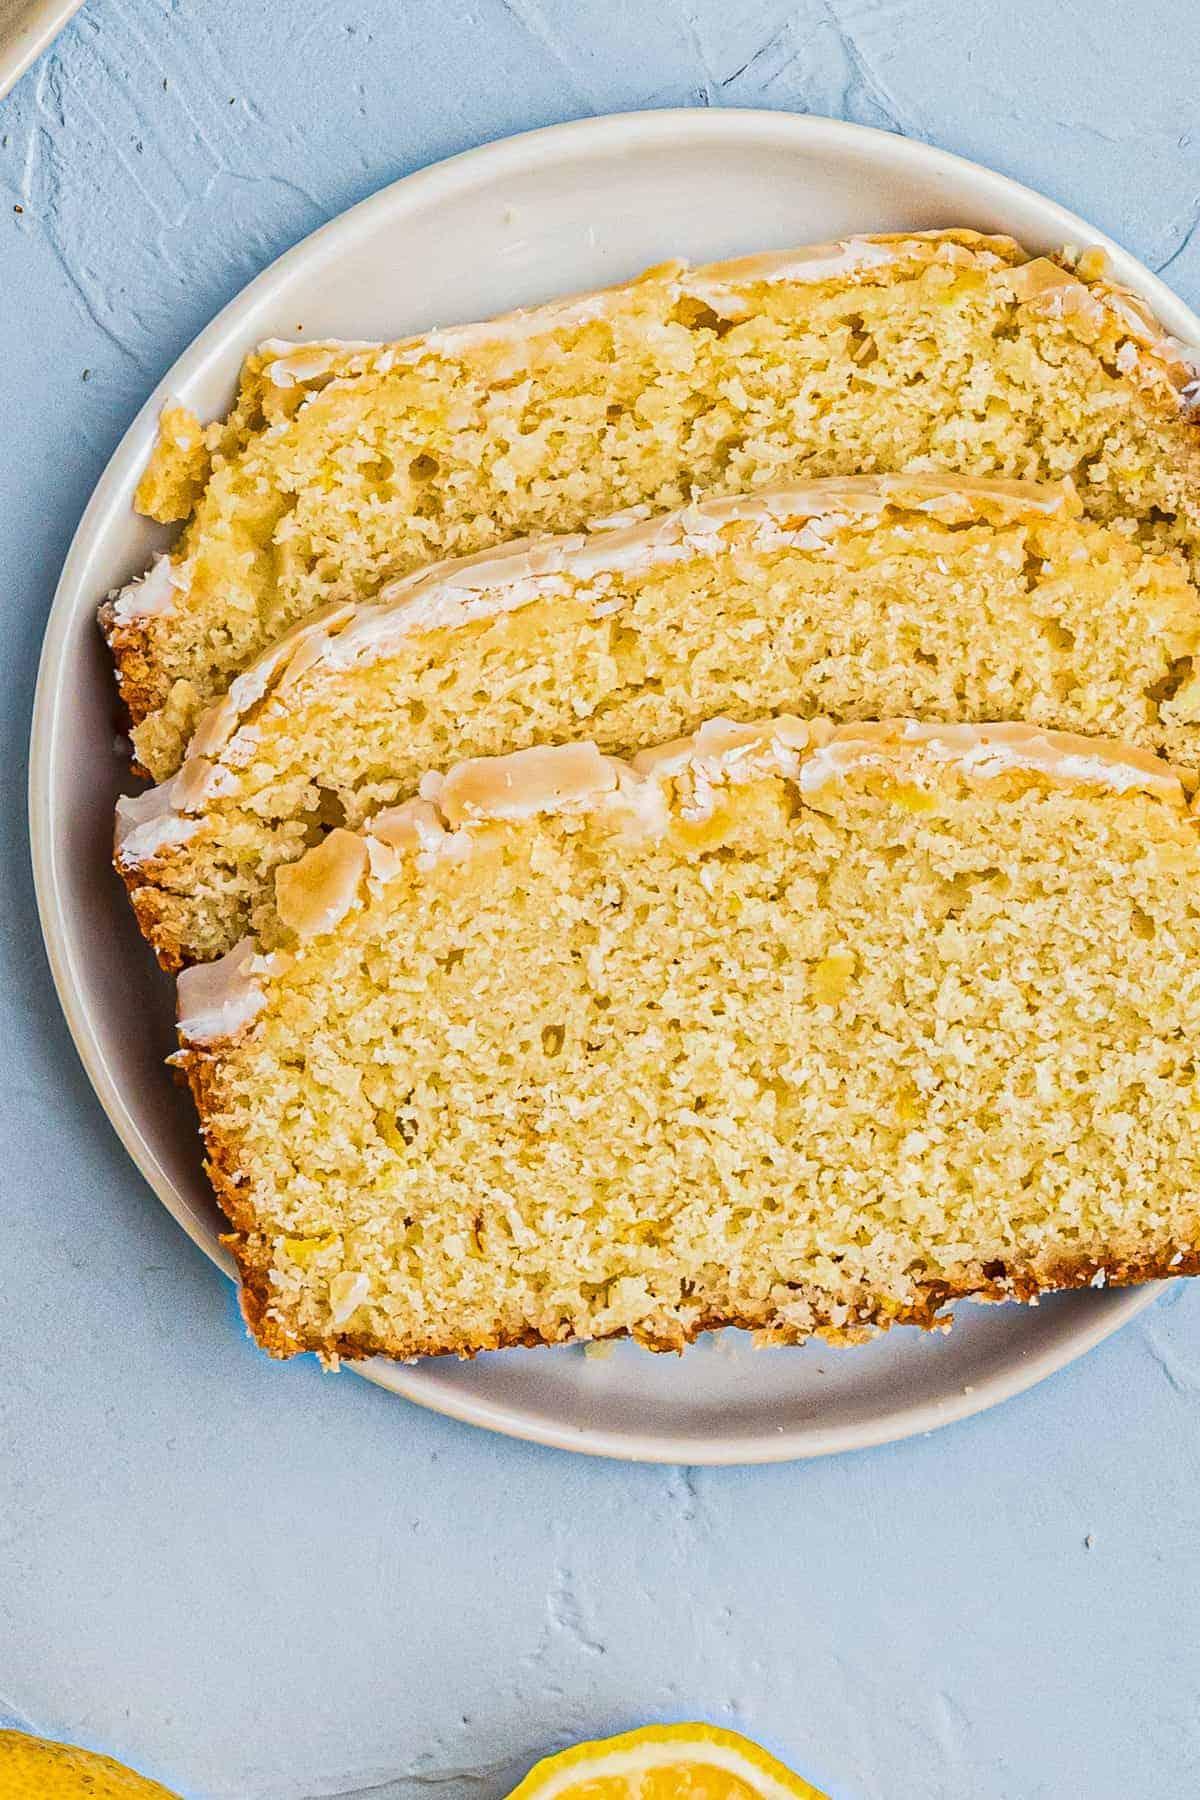 three slices of lemon pound cake on white plate